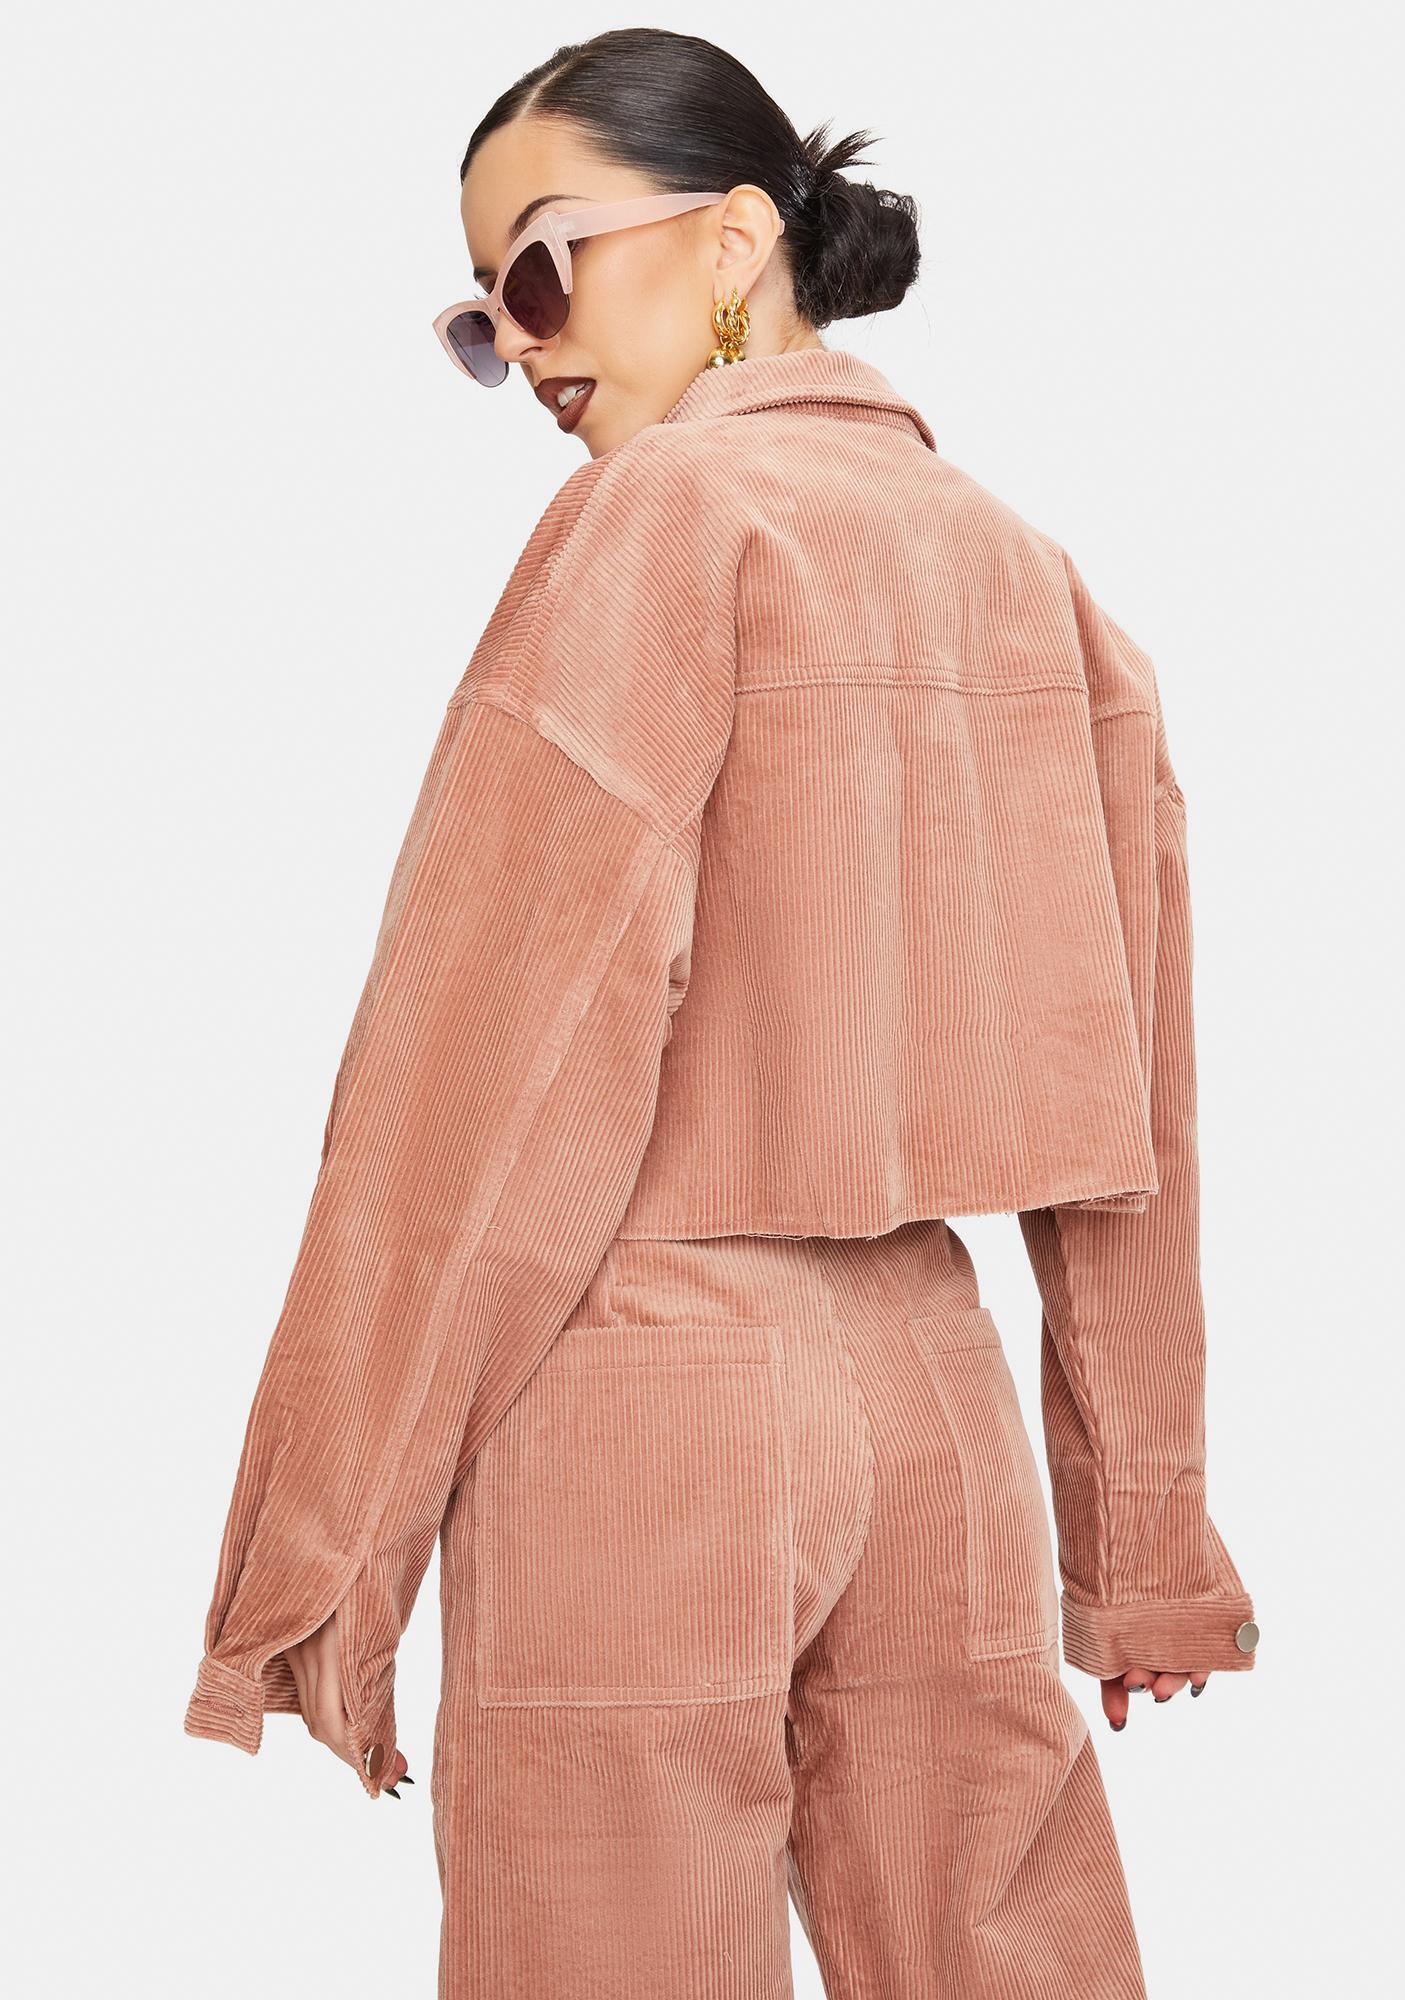 THE KRIPT Brick Harriet Corduroy Jacket